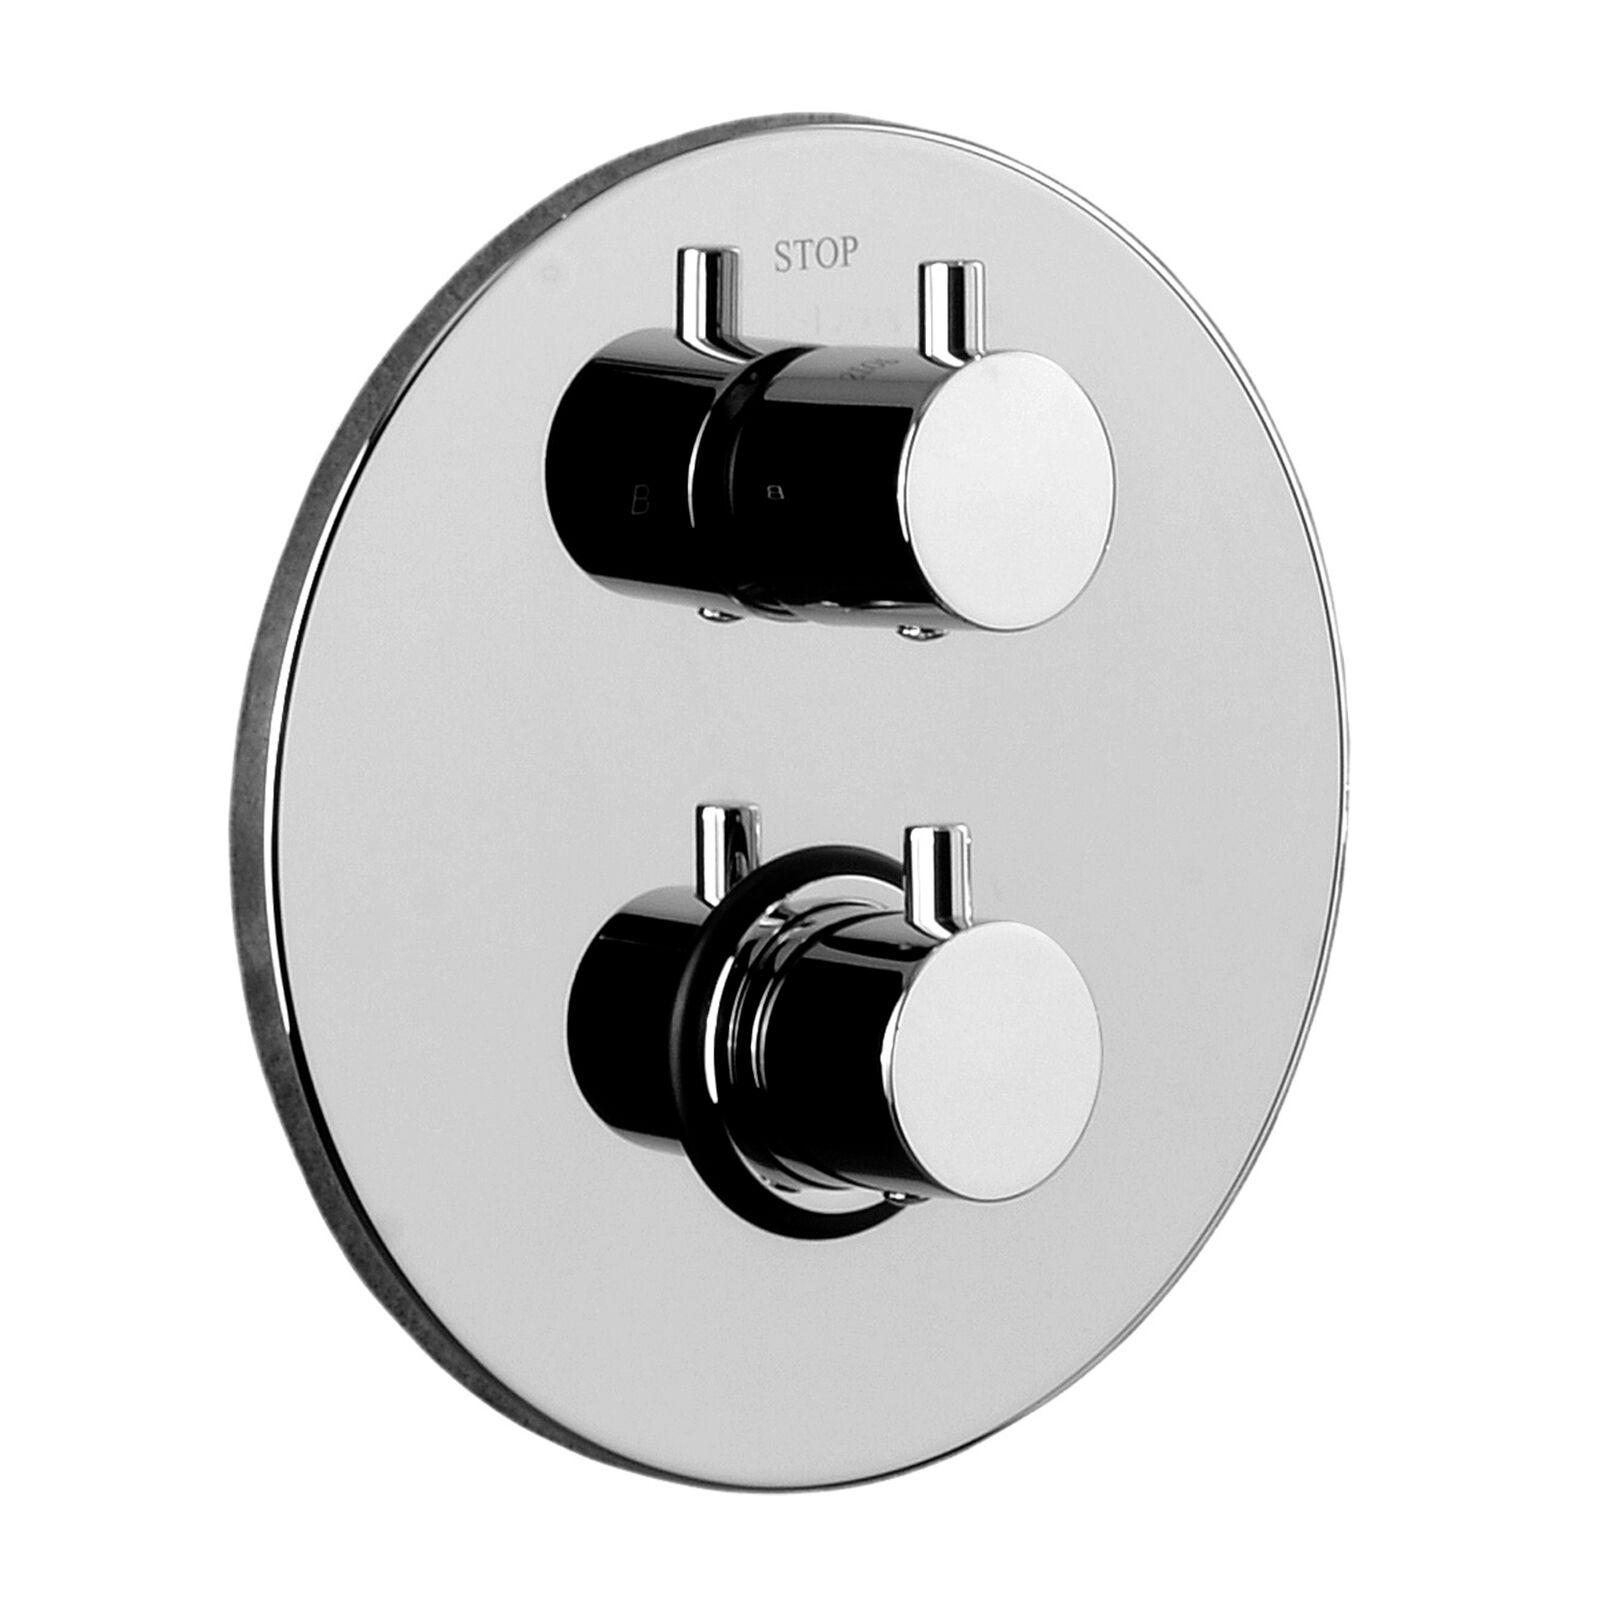 paffoni Miscelatore termostatico incasso doccia 3 uscite Paffoni Light art. LIQ019CR